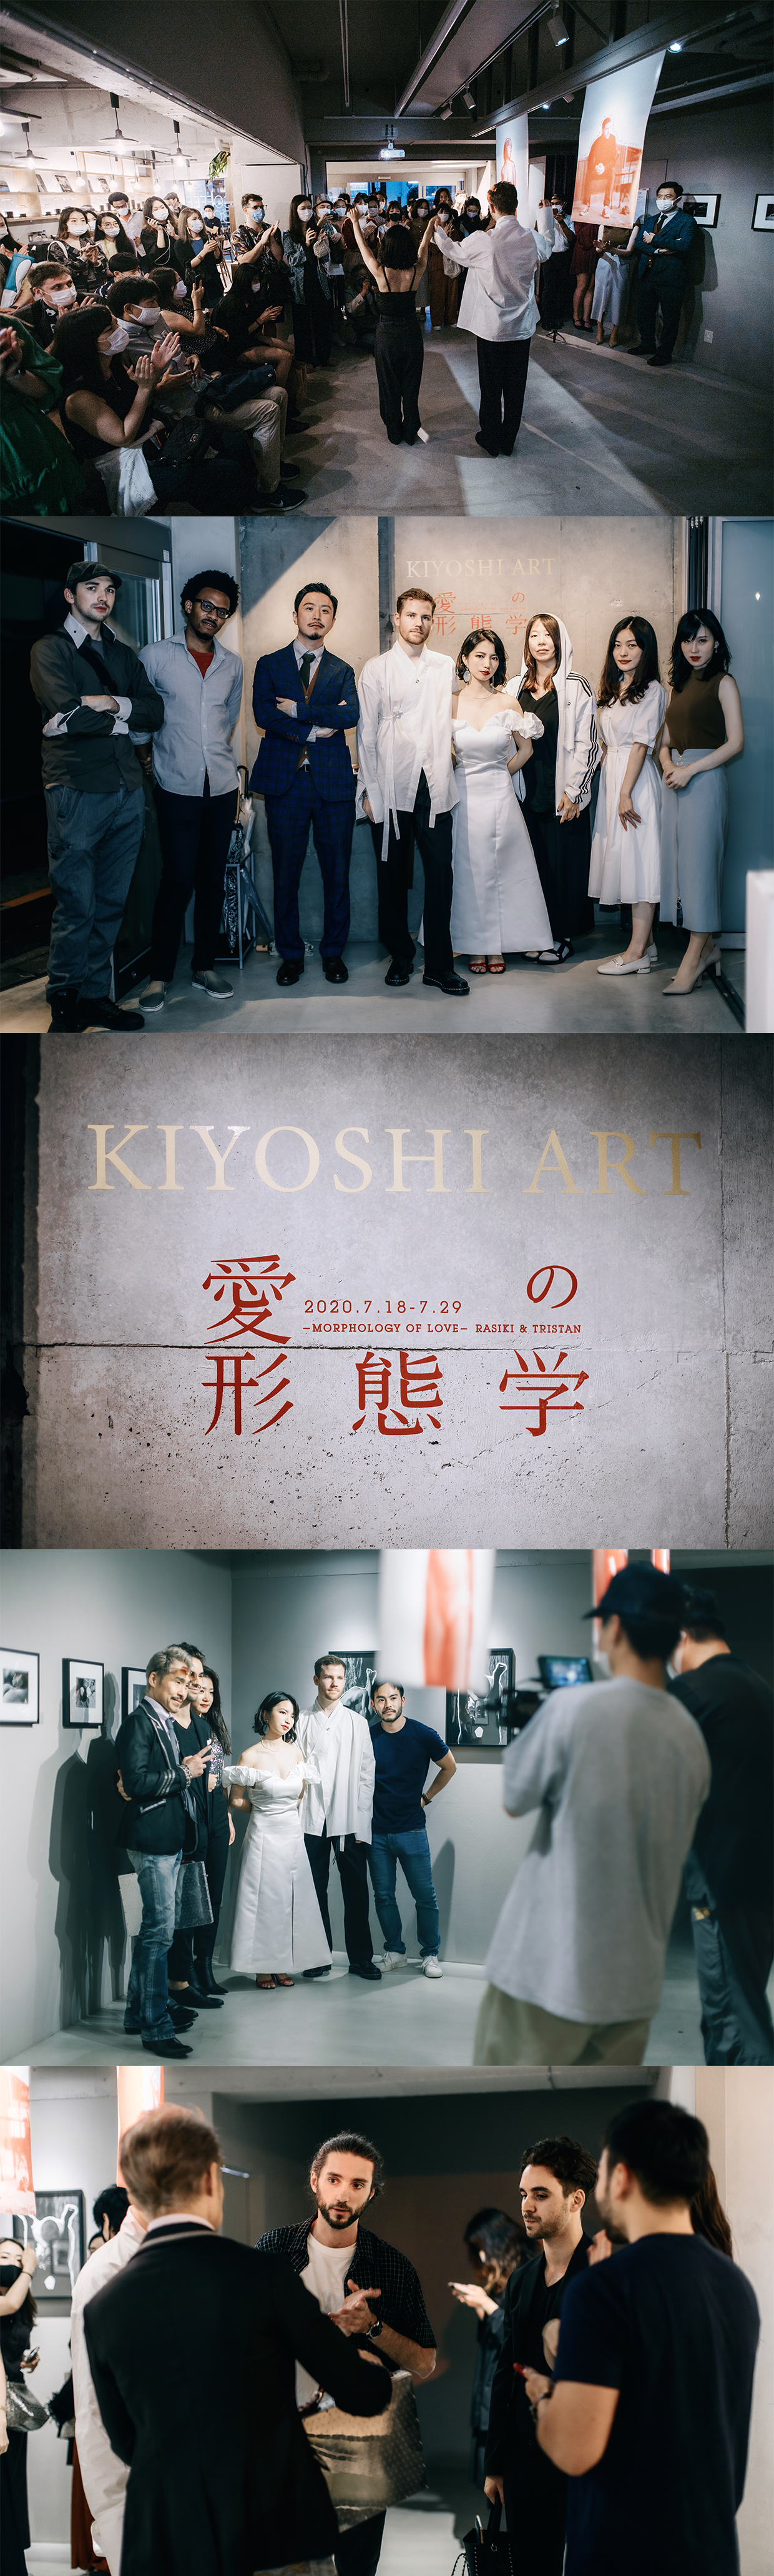 EXHIBITION - Tokyo Kiyoshi Art Space